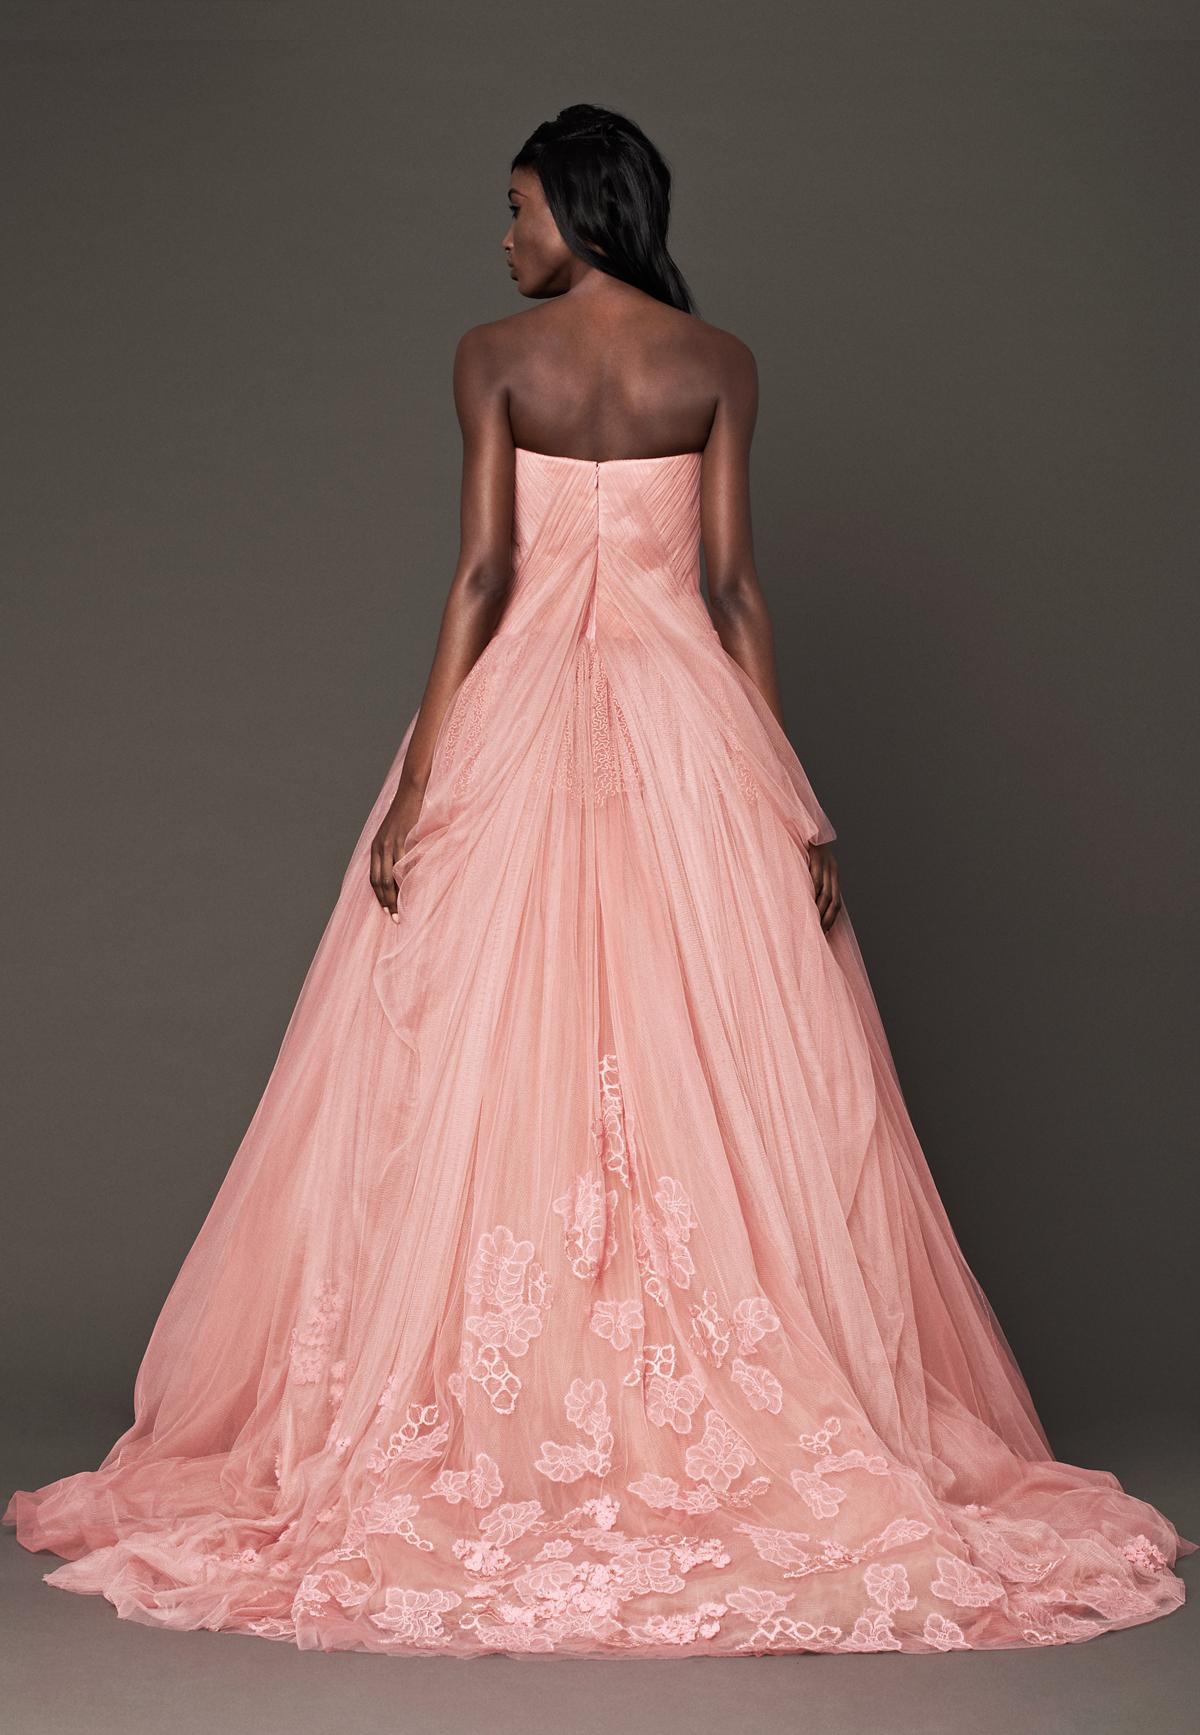 Kejli-Kuoko-i-ee-svadebnoe-plate2 Кейли Куоко и ее свадебное платье